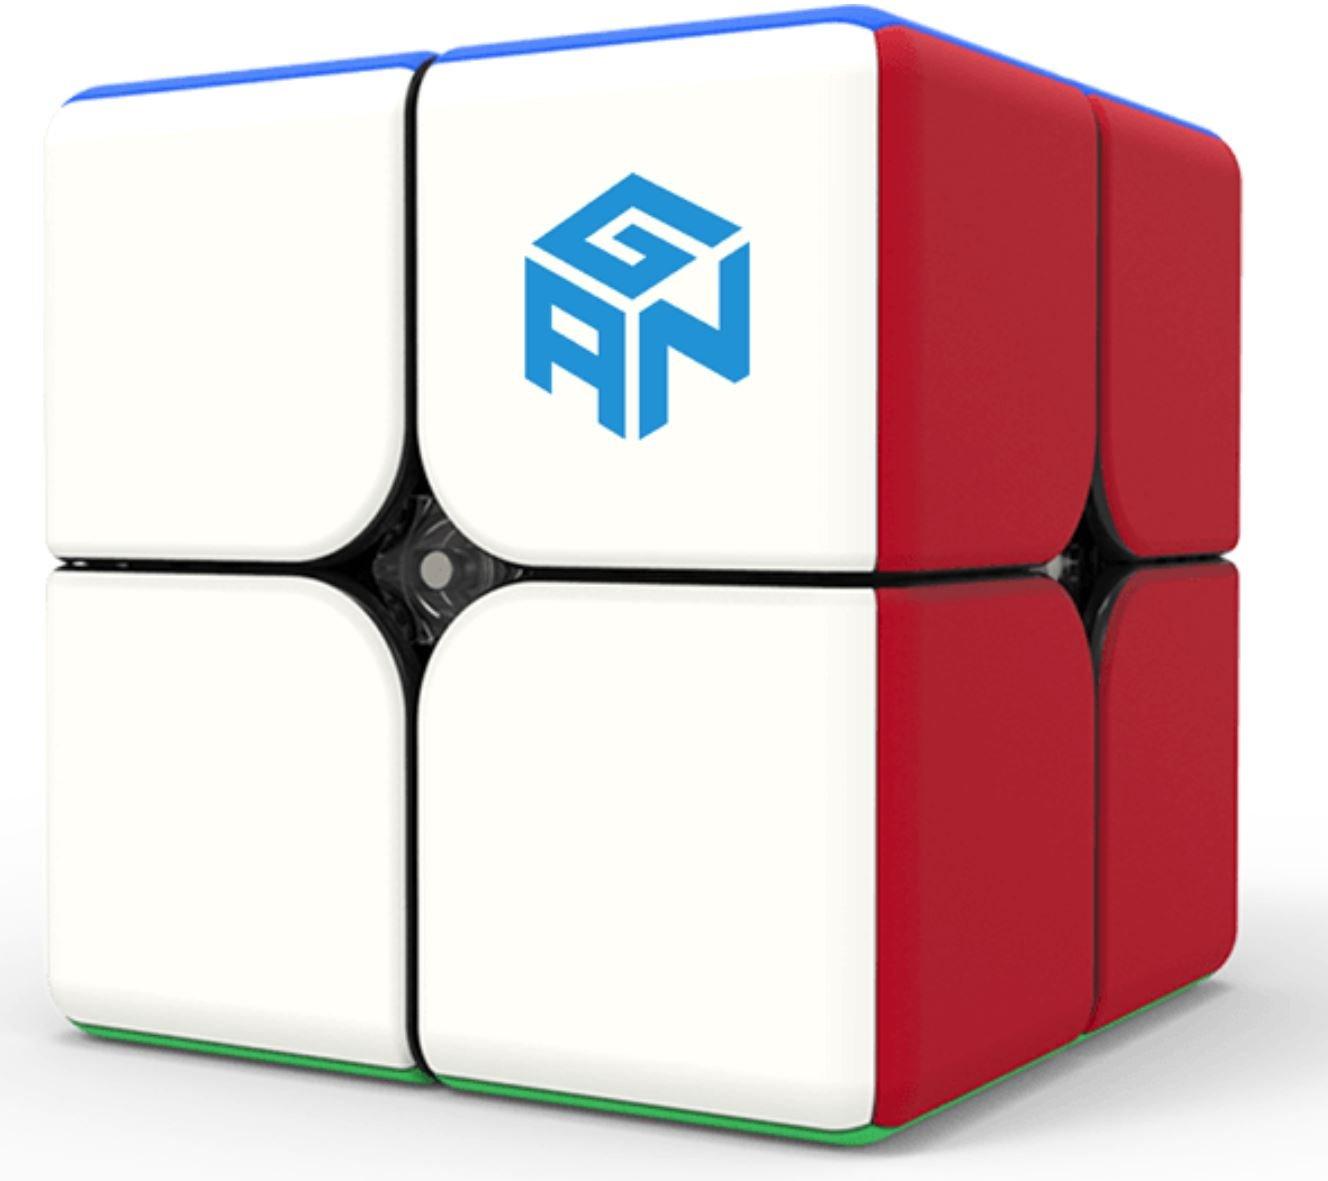 GAN 249 V2 M Magnetic Stickerlos - Zauberwürfel mit Magnition - GAN249 V2M - 2x2x2 Speed Cube Gans 249 Version 2 GAN CUBE